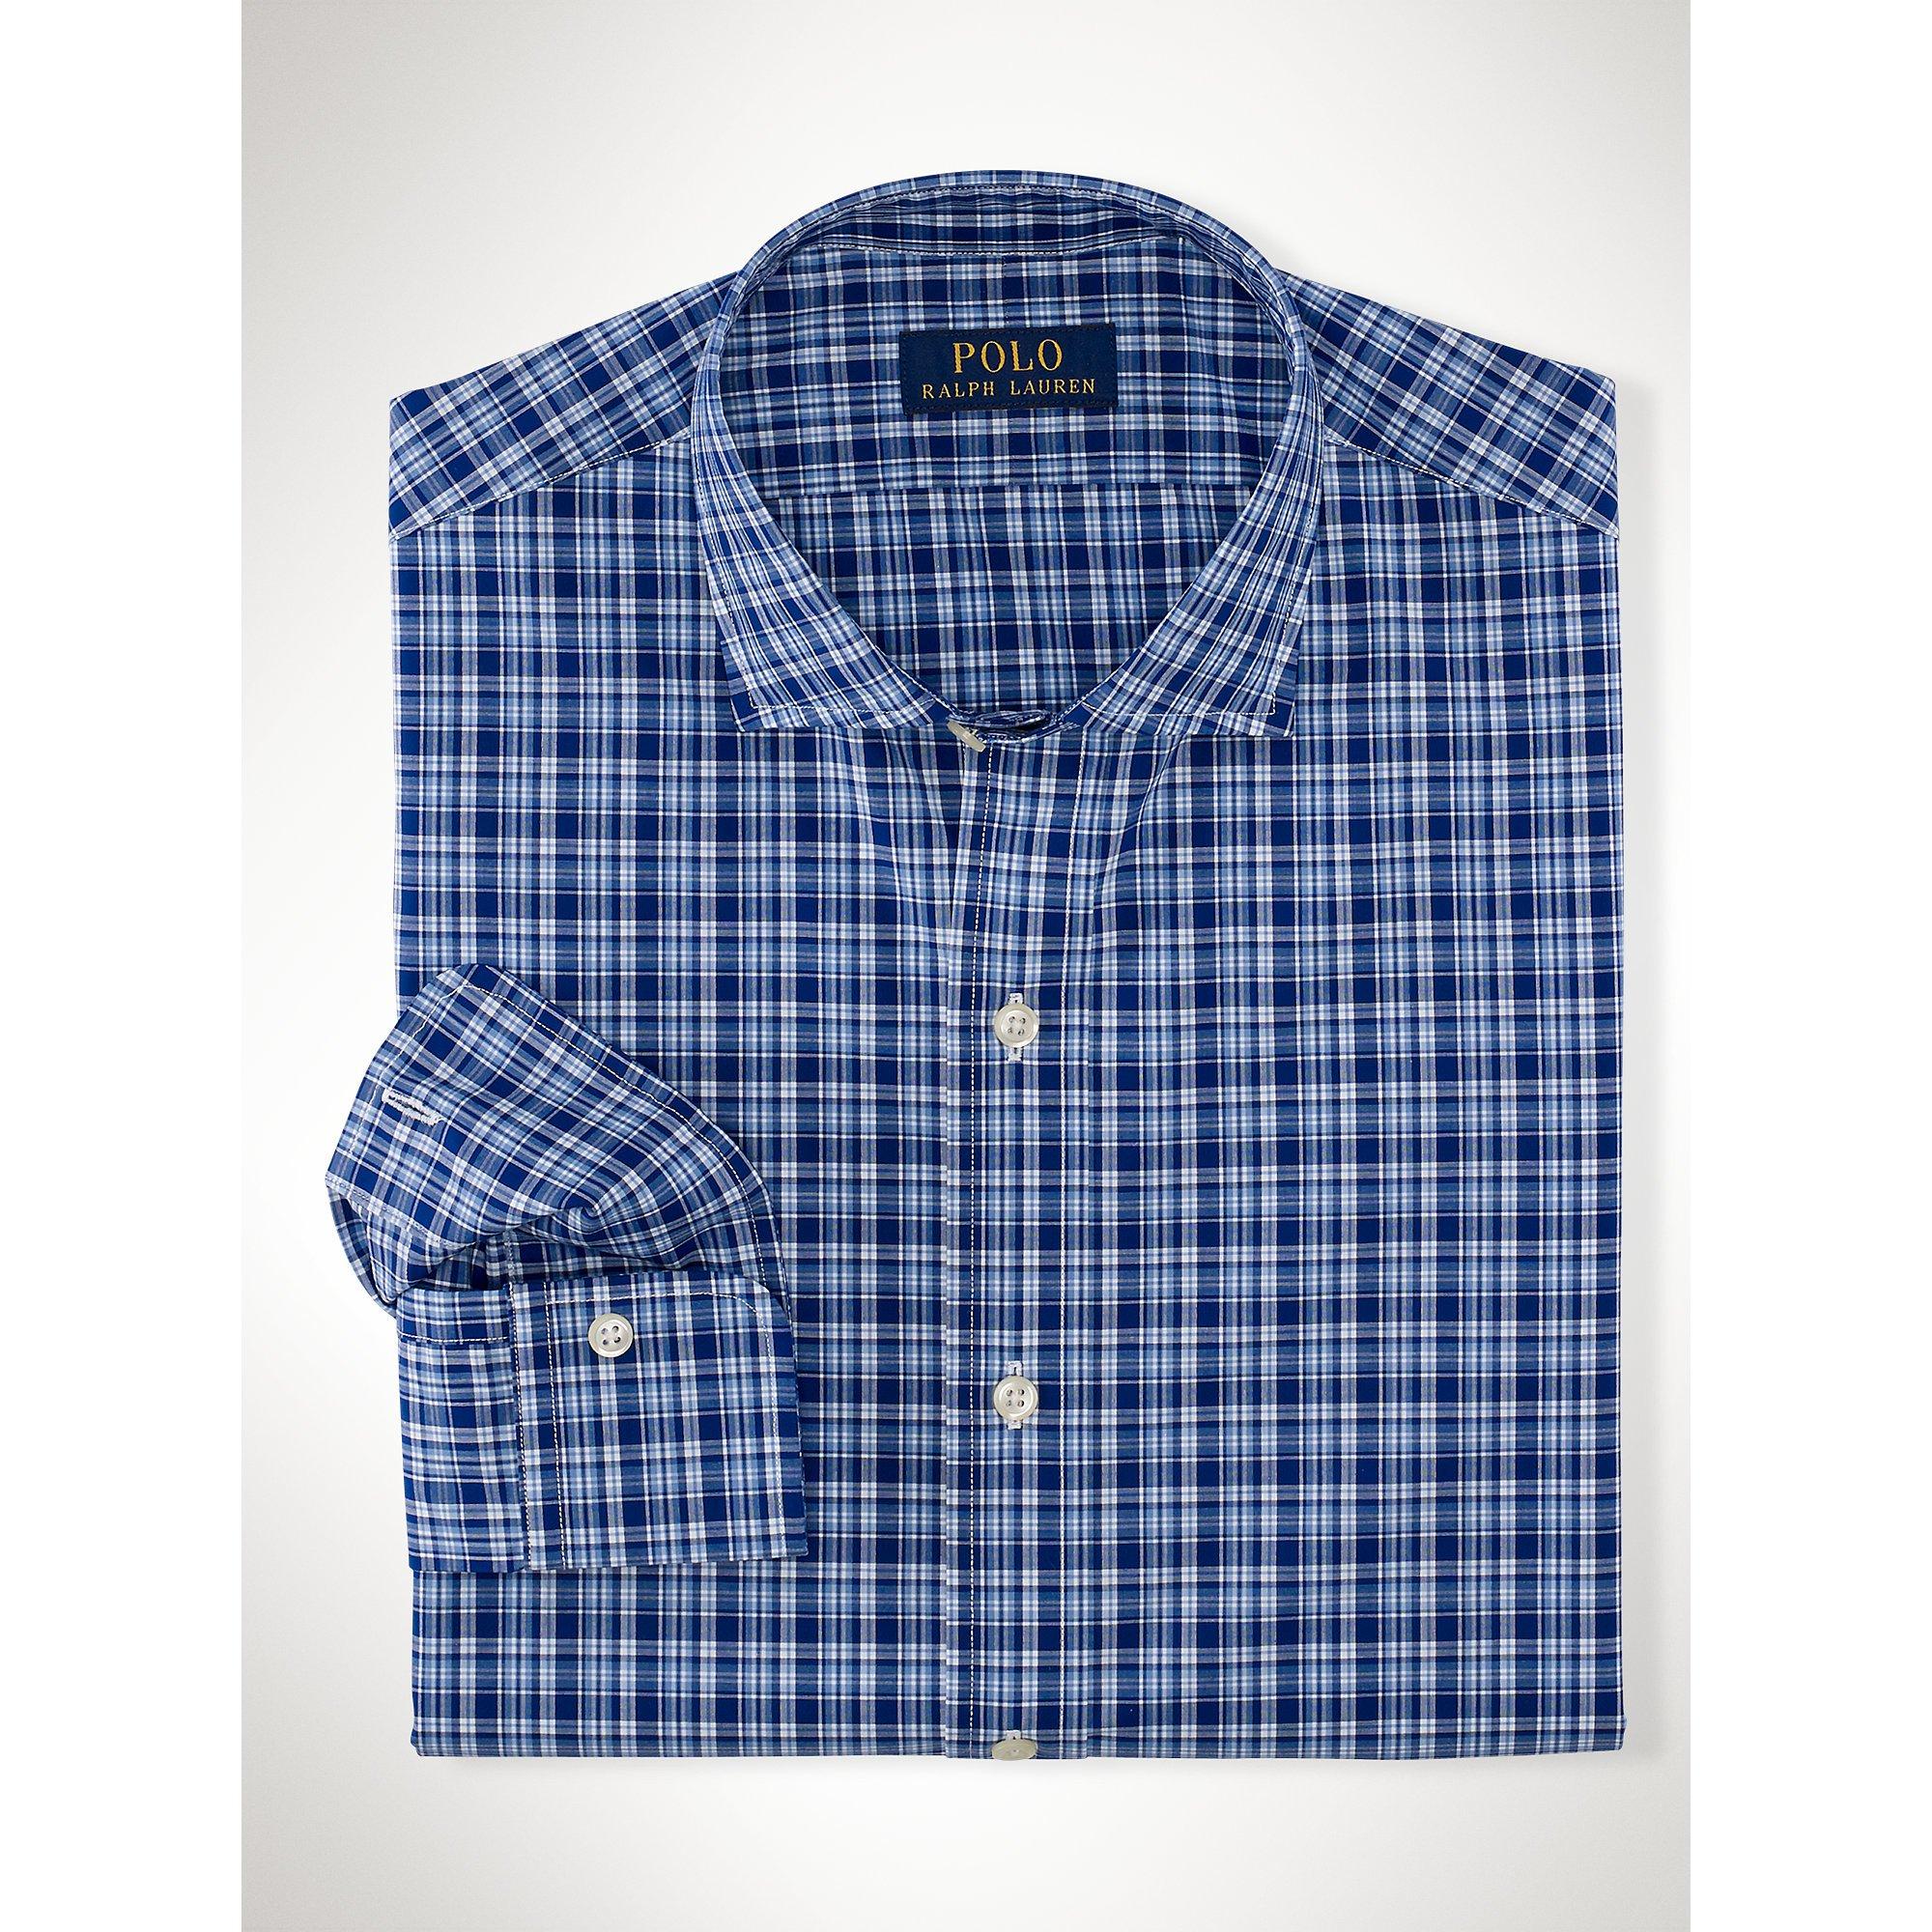 Lyst polo ralph lauren plaid cotton poplin shirt in blue for Navy blue plaid shirt